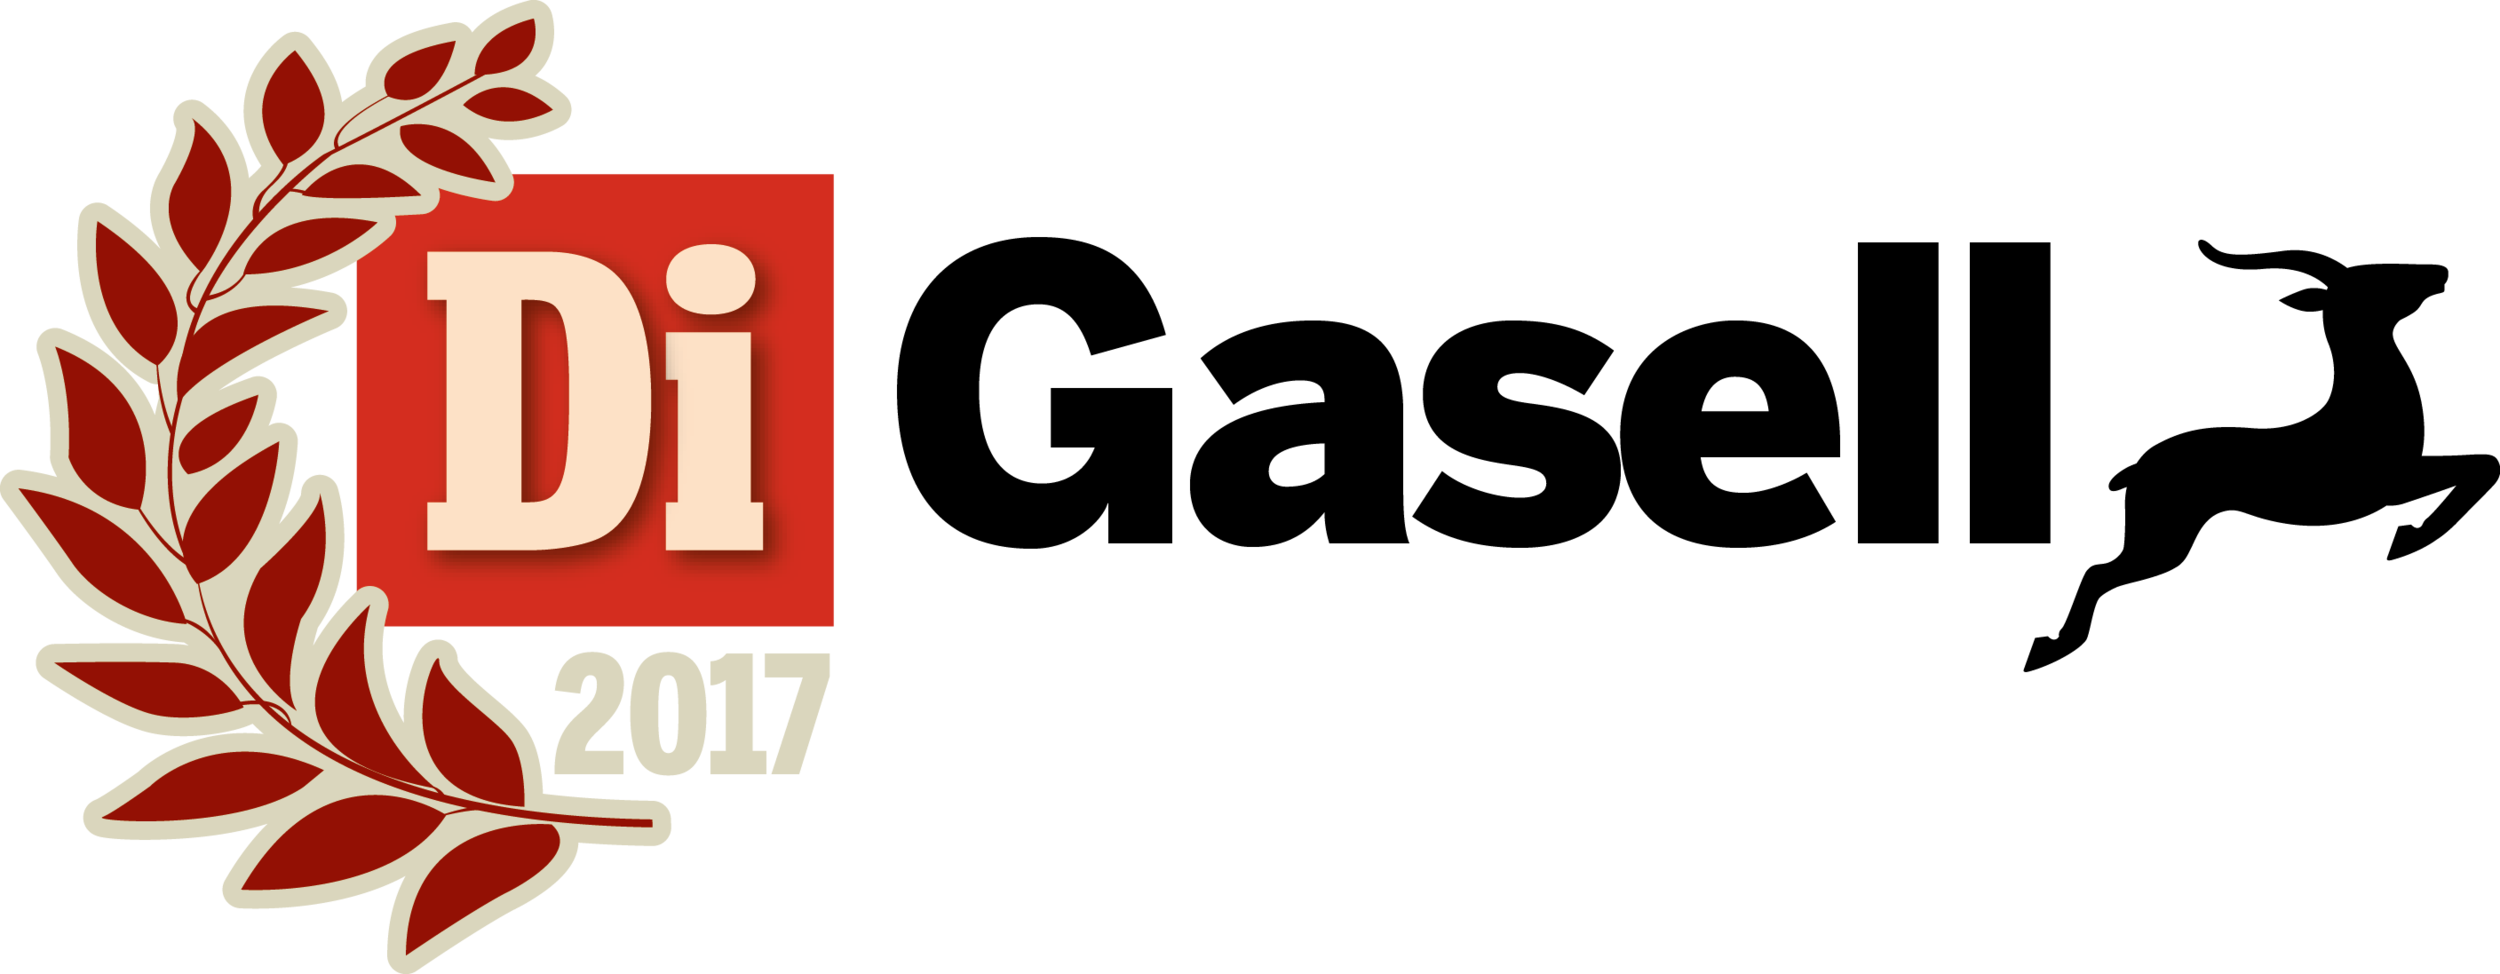 di_gasell_Gasellvinnare 2017.png